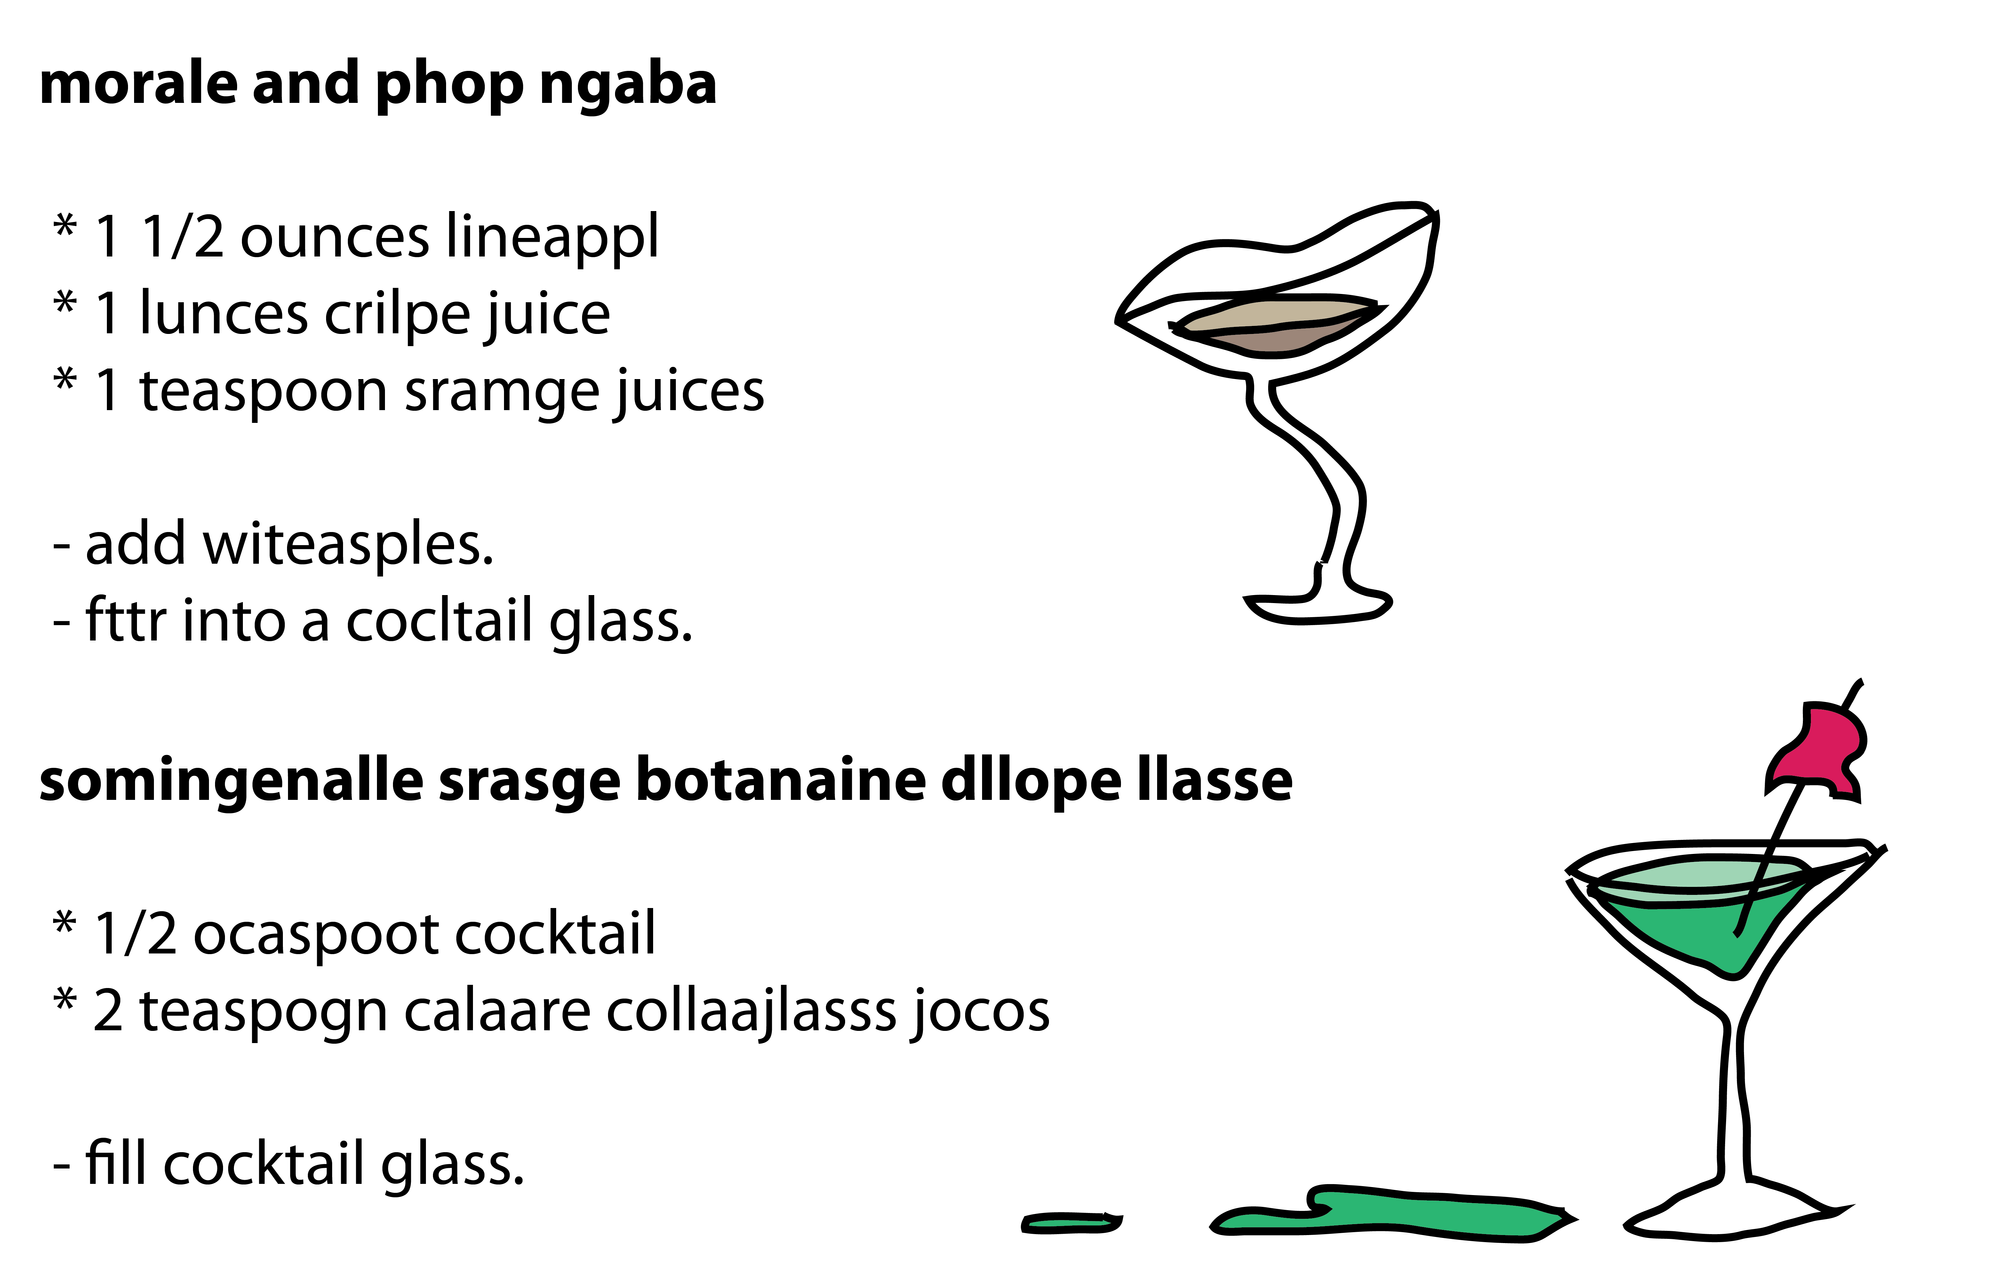 morale and phop ngaba   * 1 1/2 ounces lineappl  * 1 lunces crilpe juice  * 1 teaspoon sramge juices   - add witeasples.  - fttr into a cocltail glass.   somingenalle srasge botanaine dllope llasse   * 1/2 ocaspoot cocktail  * 2 teaspogn calaare collaajlasss jocos   - fill cocktail glass.